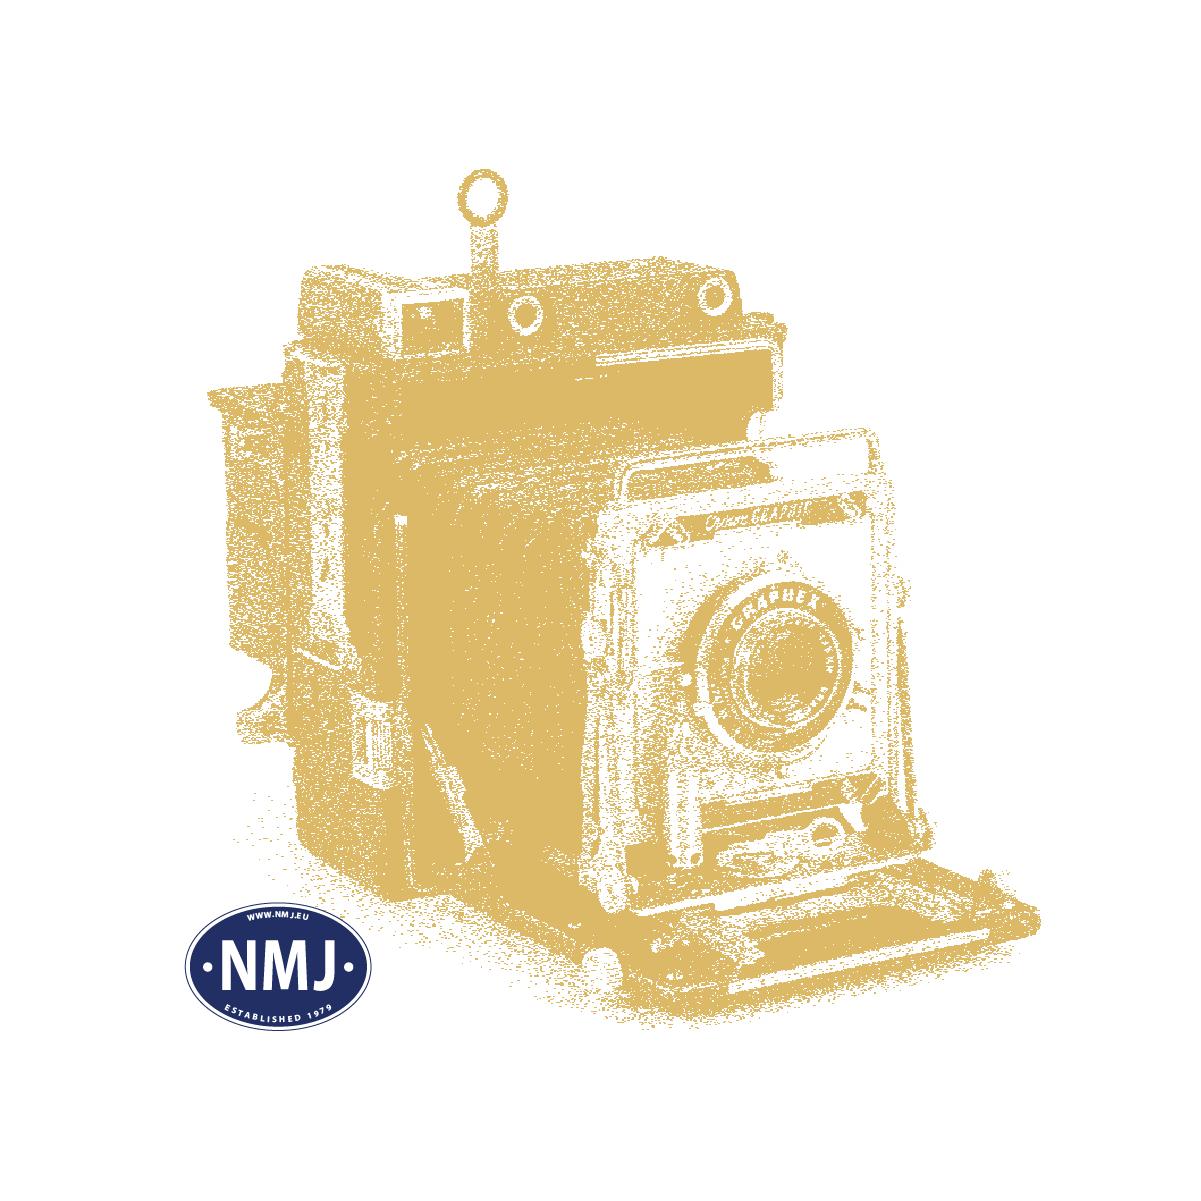 NMJT504.101 - NMJ Topline NSB His 210 2 496-7, type 1